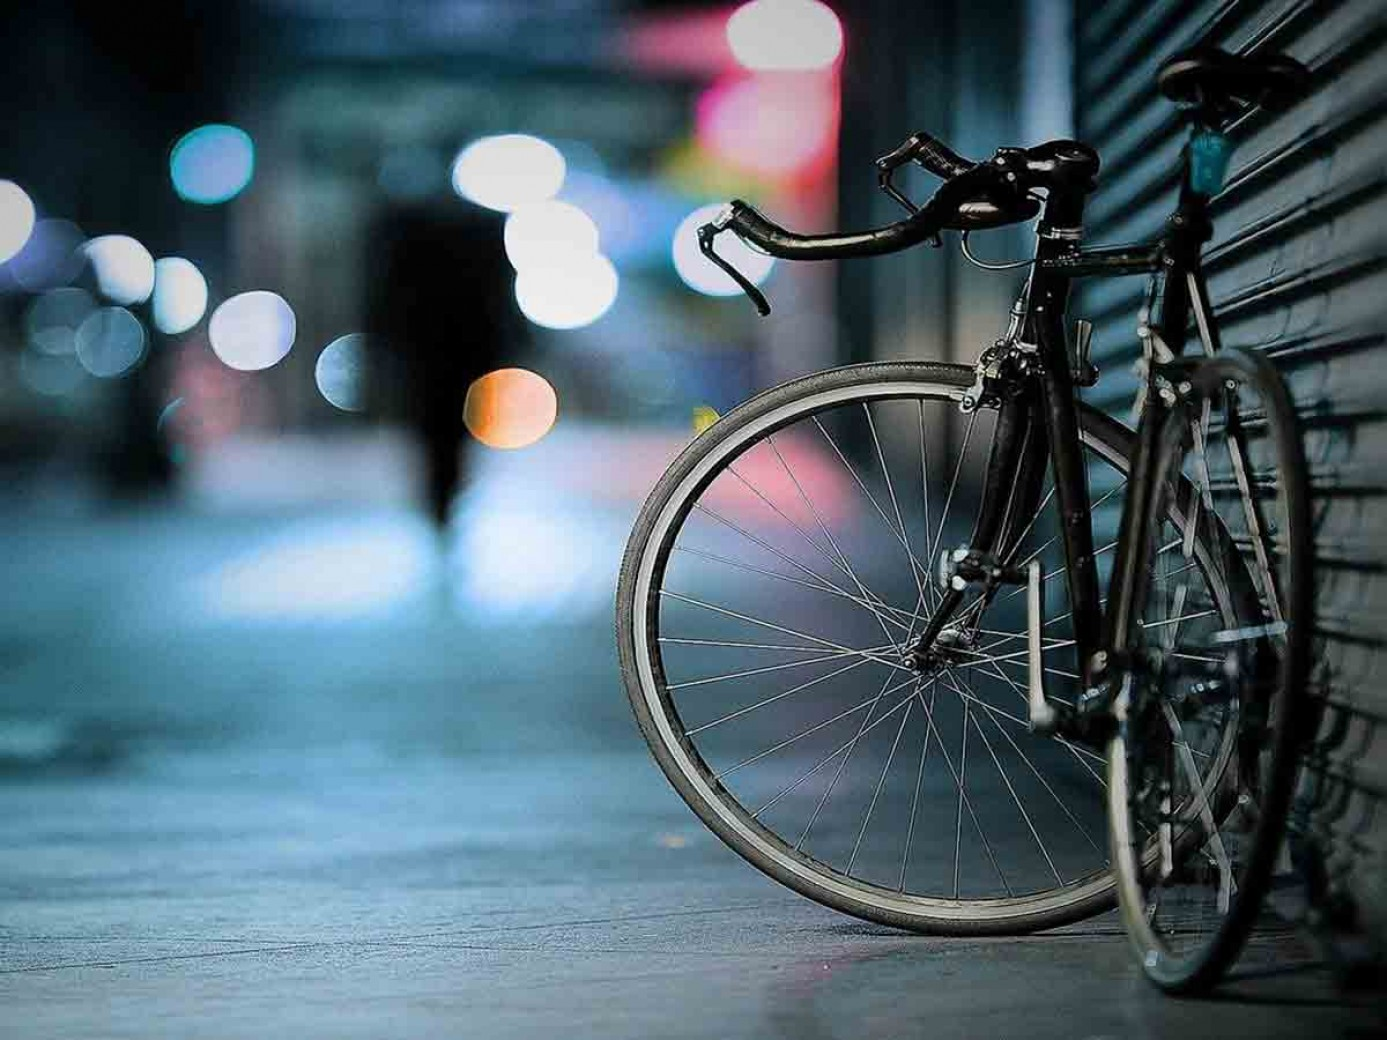 oms-recomienda-bici-semana/